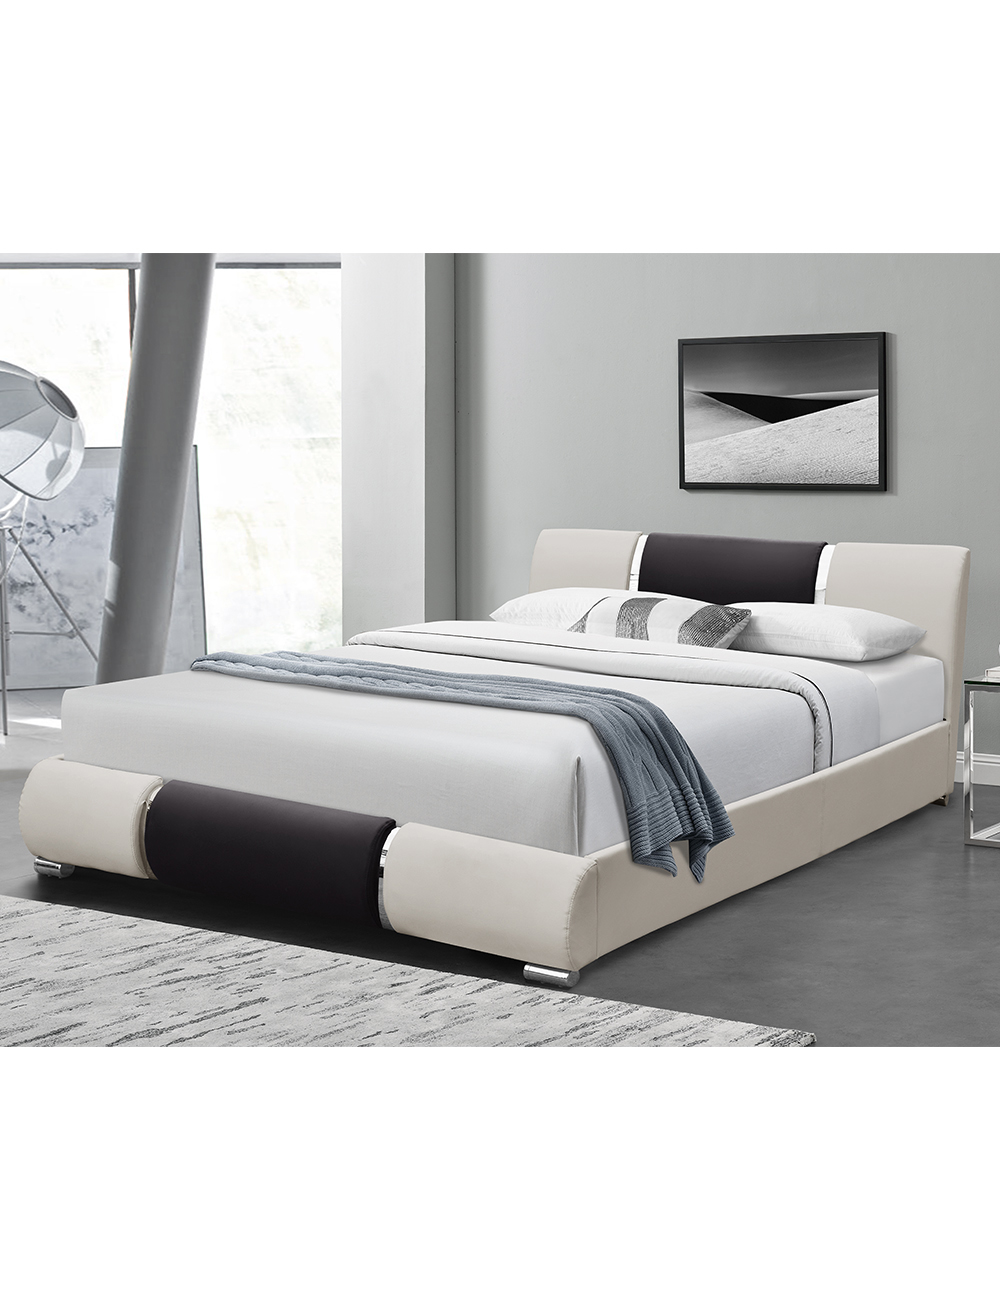 bett sana 140 x 200 cm. Black Bedroom Furniture Sets. Home Design Ideas